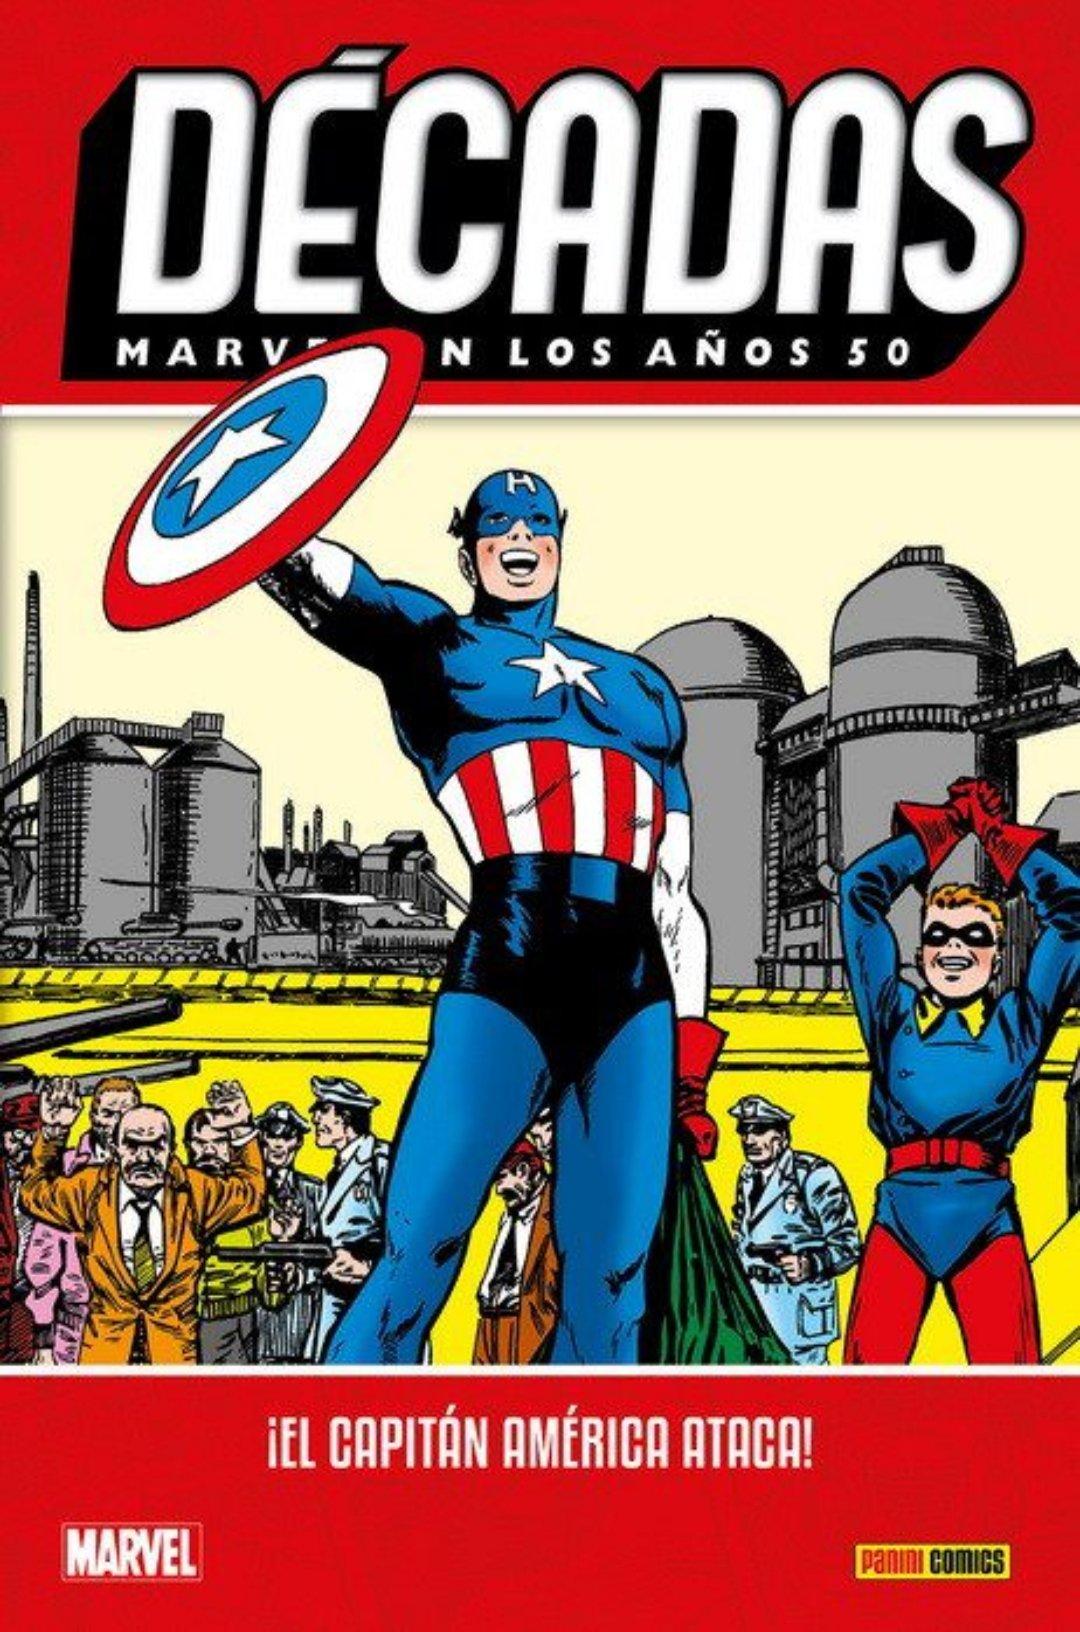 Décadas Marvel 2